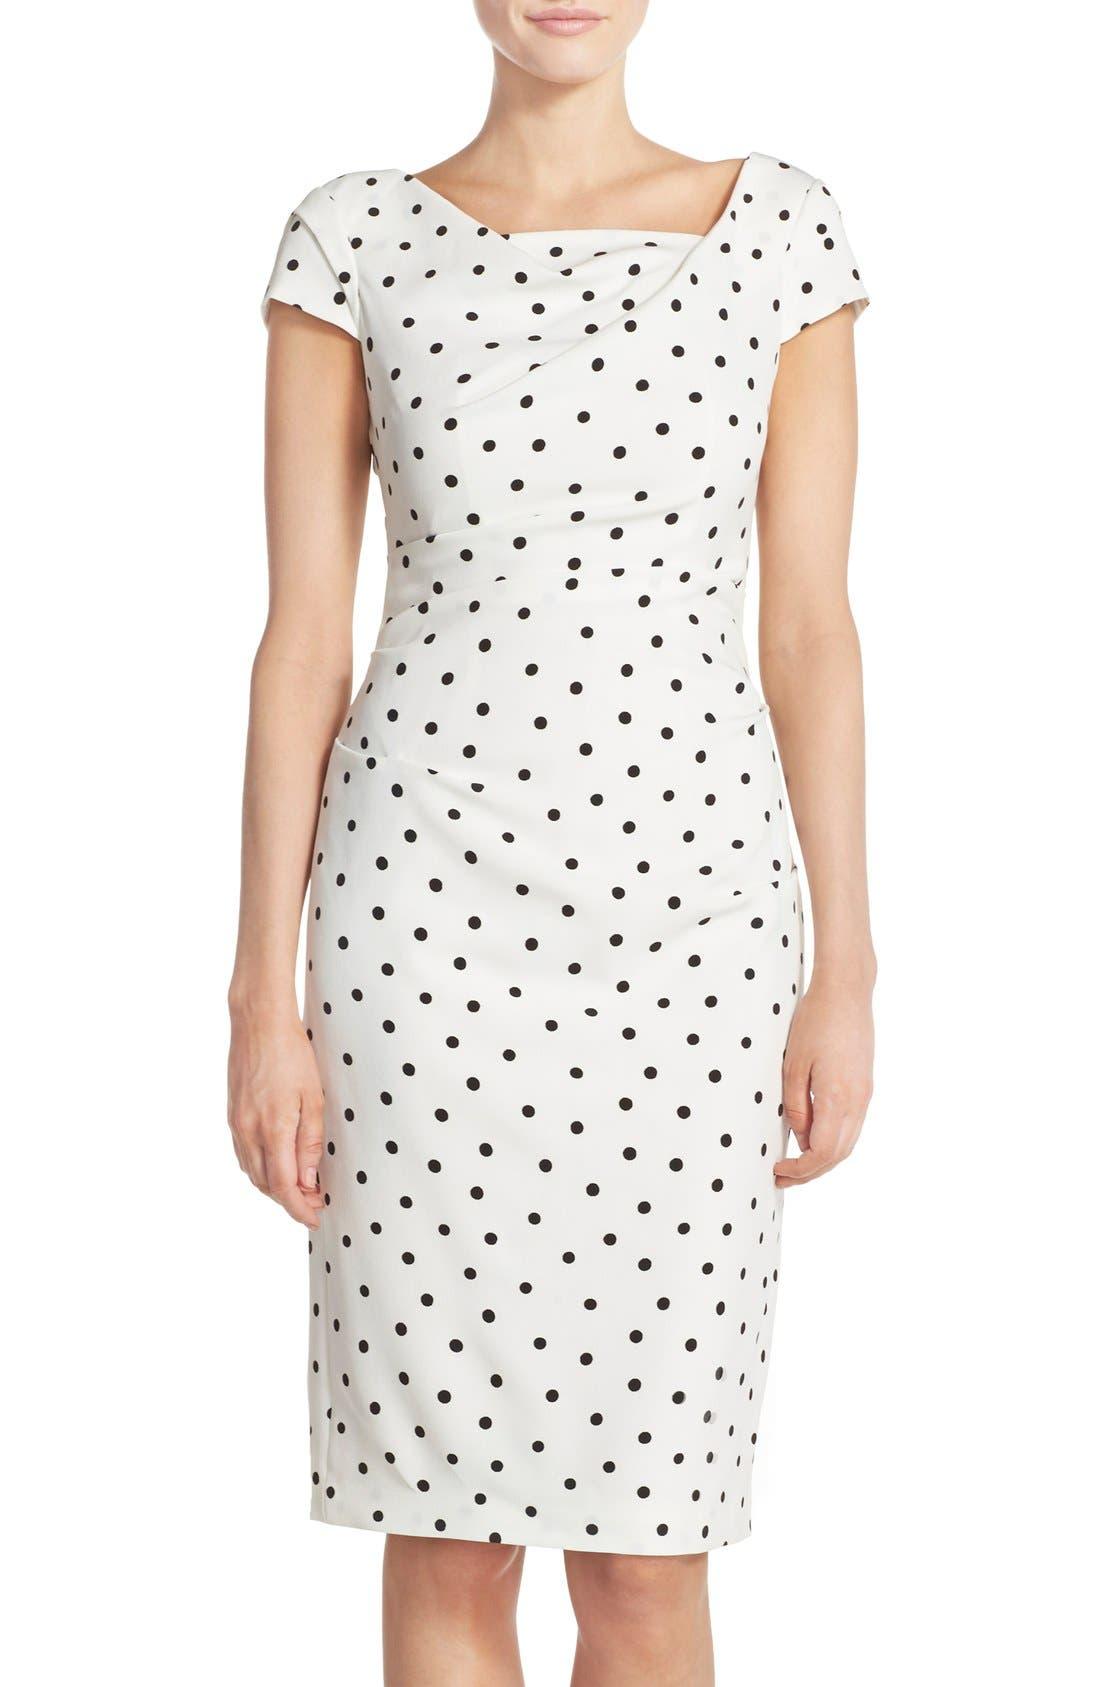 ADRIANNA PAPELL,                             Polka Dot Crepe Sheath Dress,                             Main thumbnail 1, color,                             900